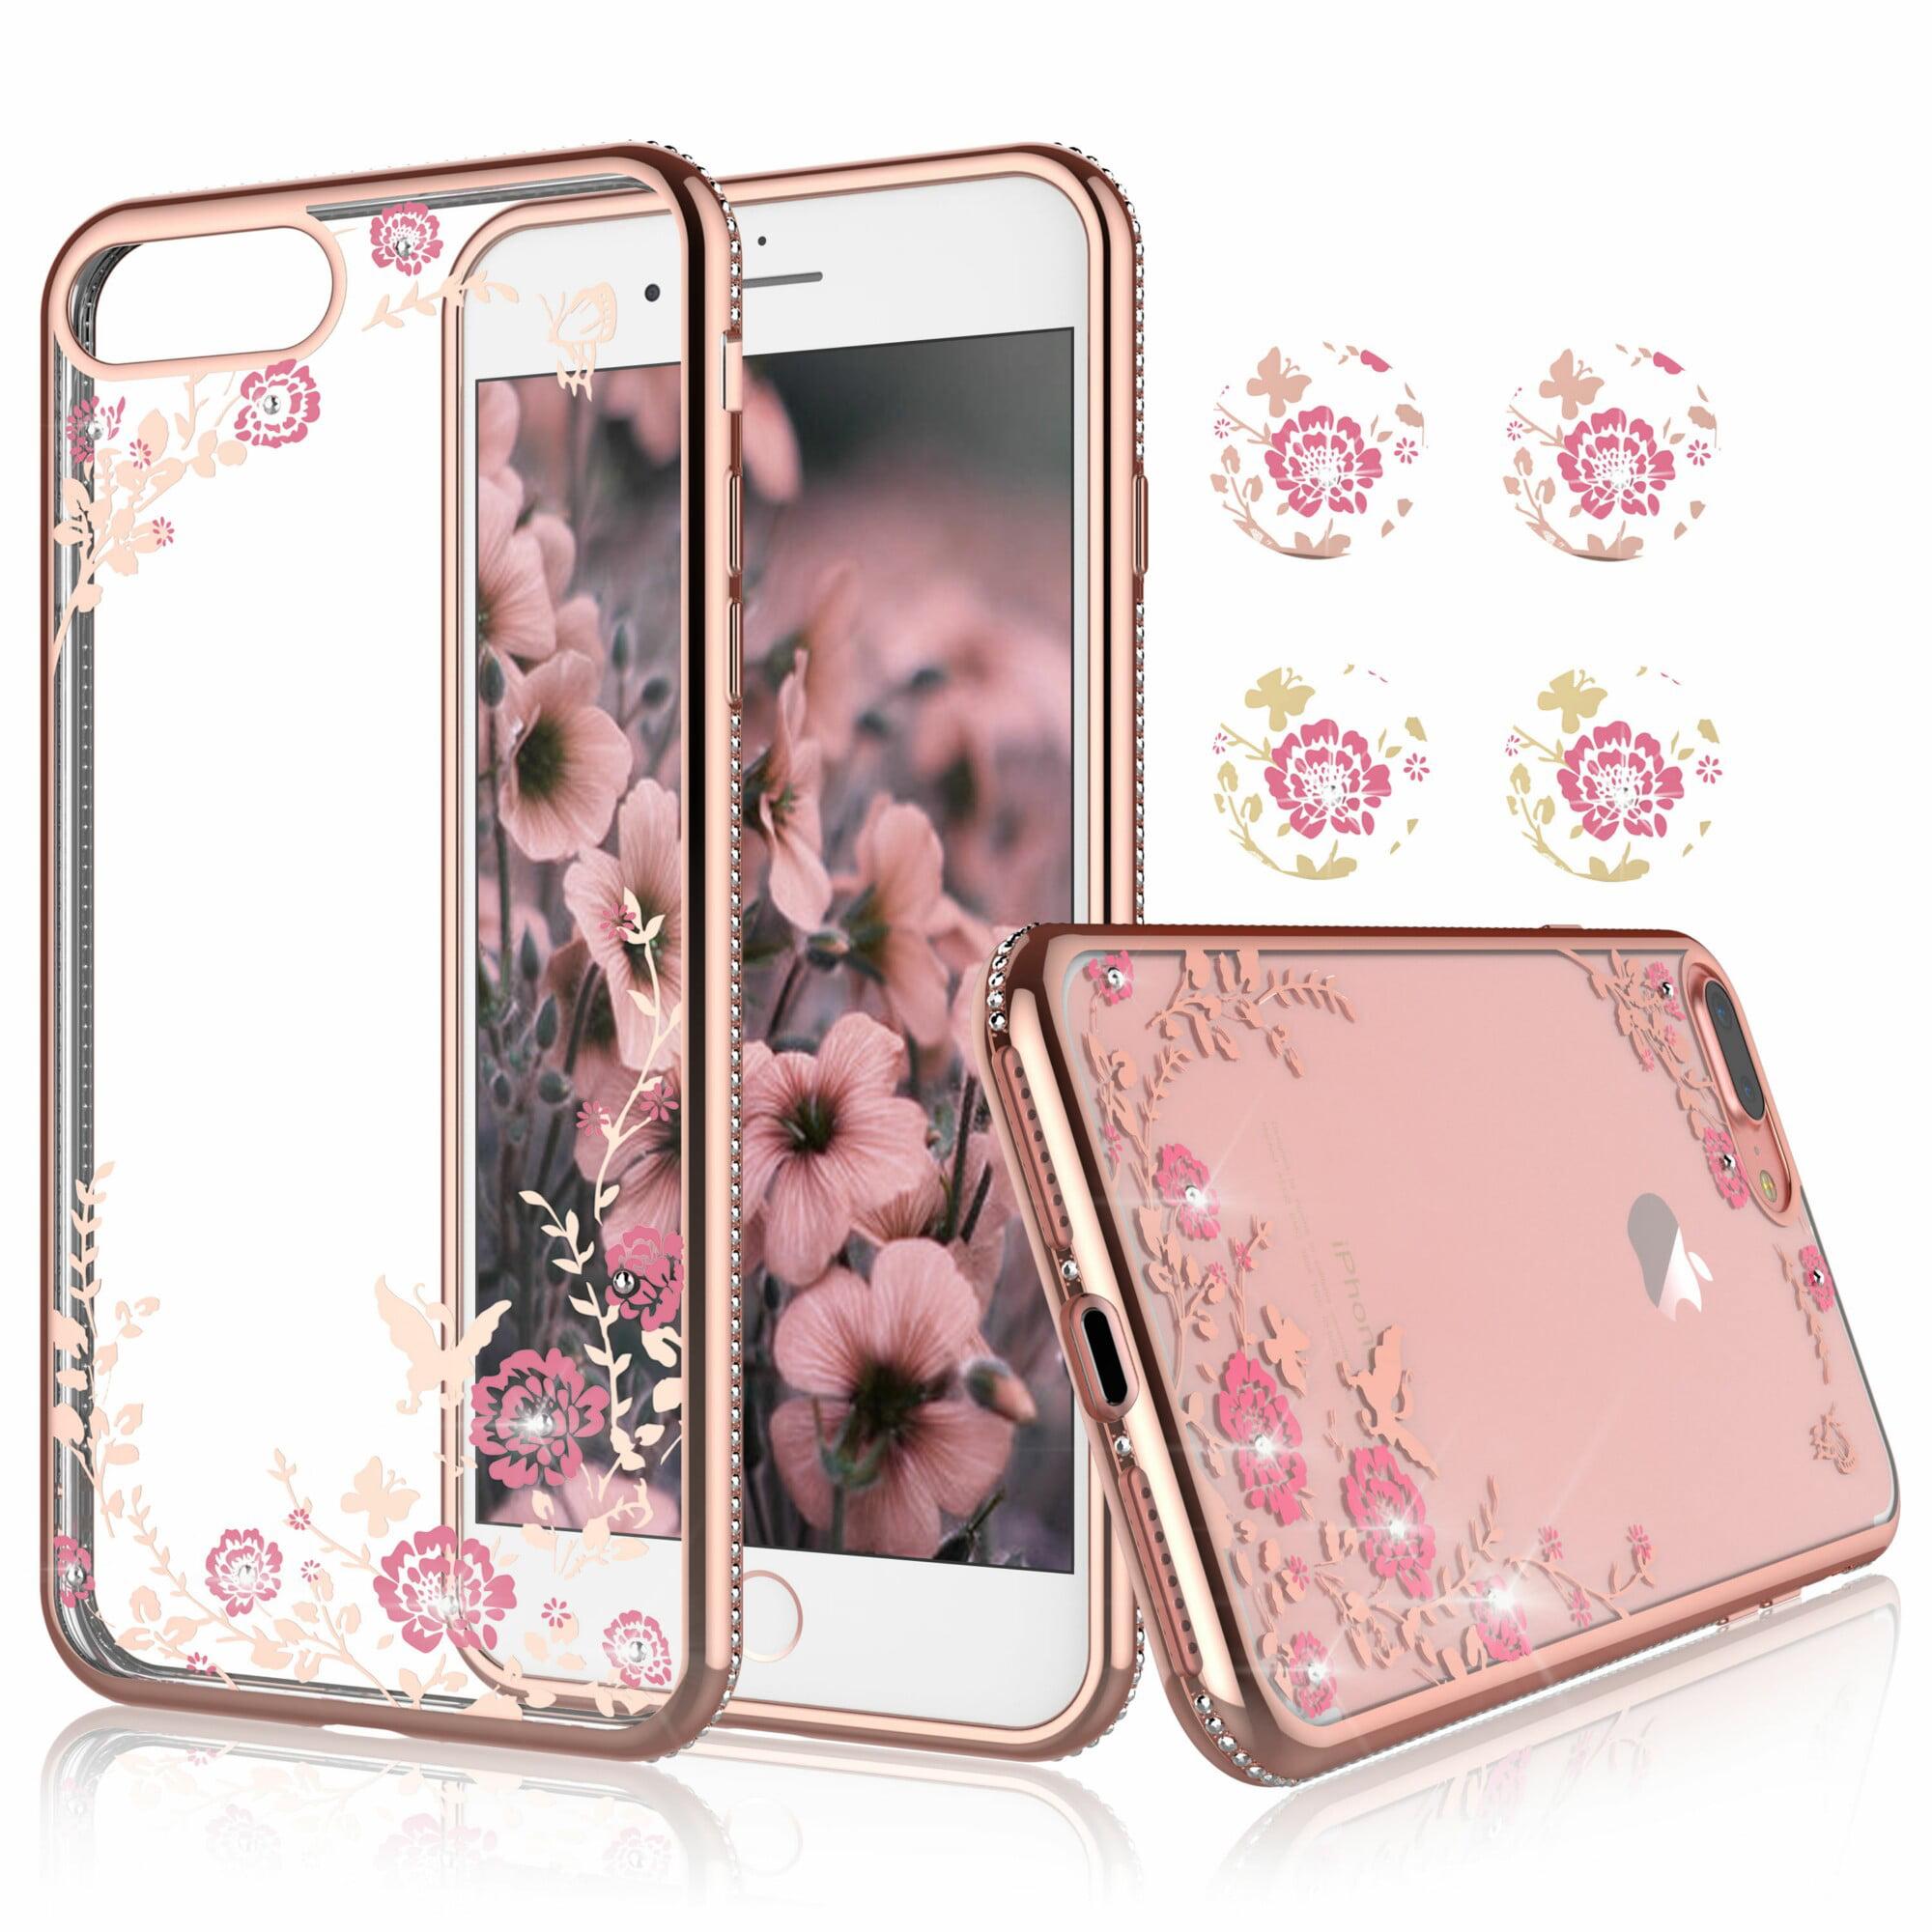 Apple iPhone 8 Plus 7 Plus 6s Plus 6 Plus X 8 7 6s 6 Cases, Njjex Ultra Clear hybrid Floral Printed Flower Sparkle Glitter SoftTPU